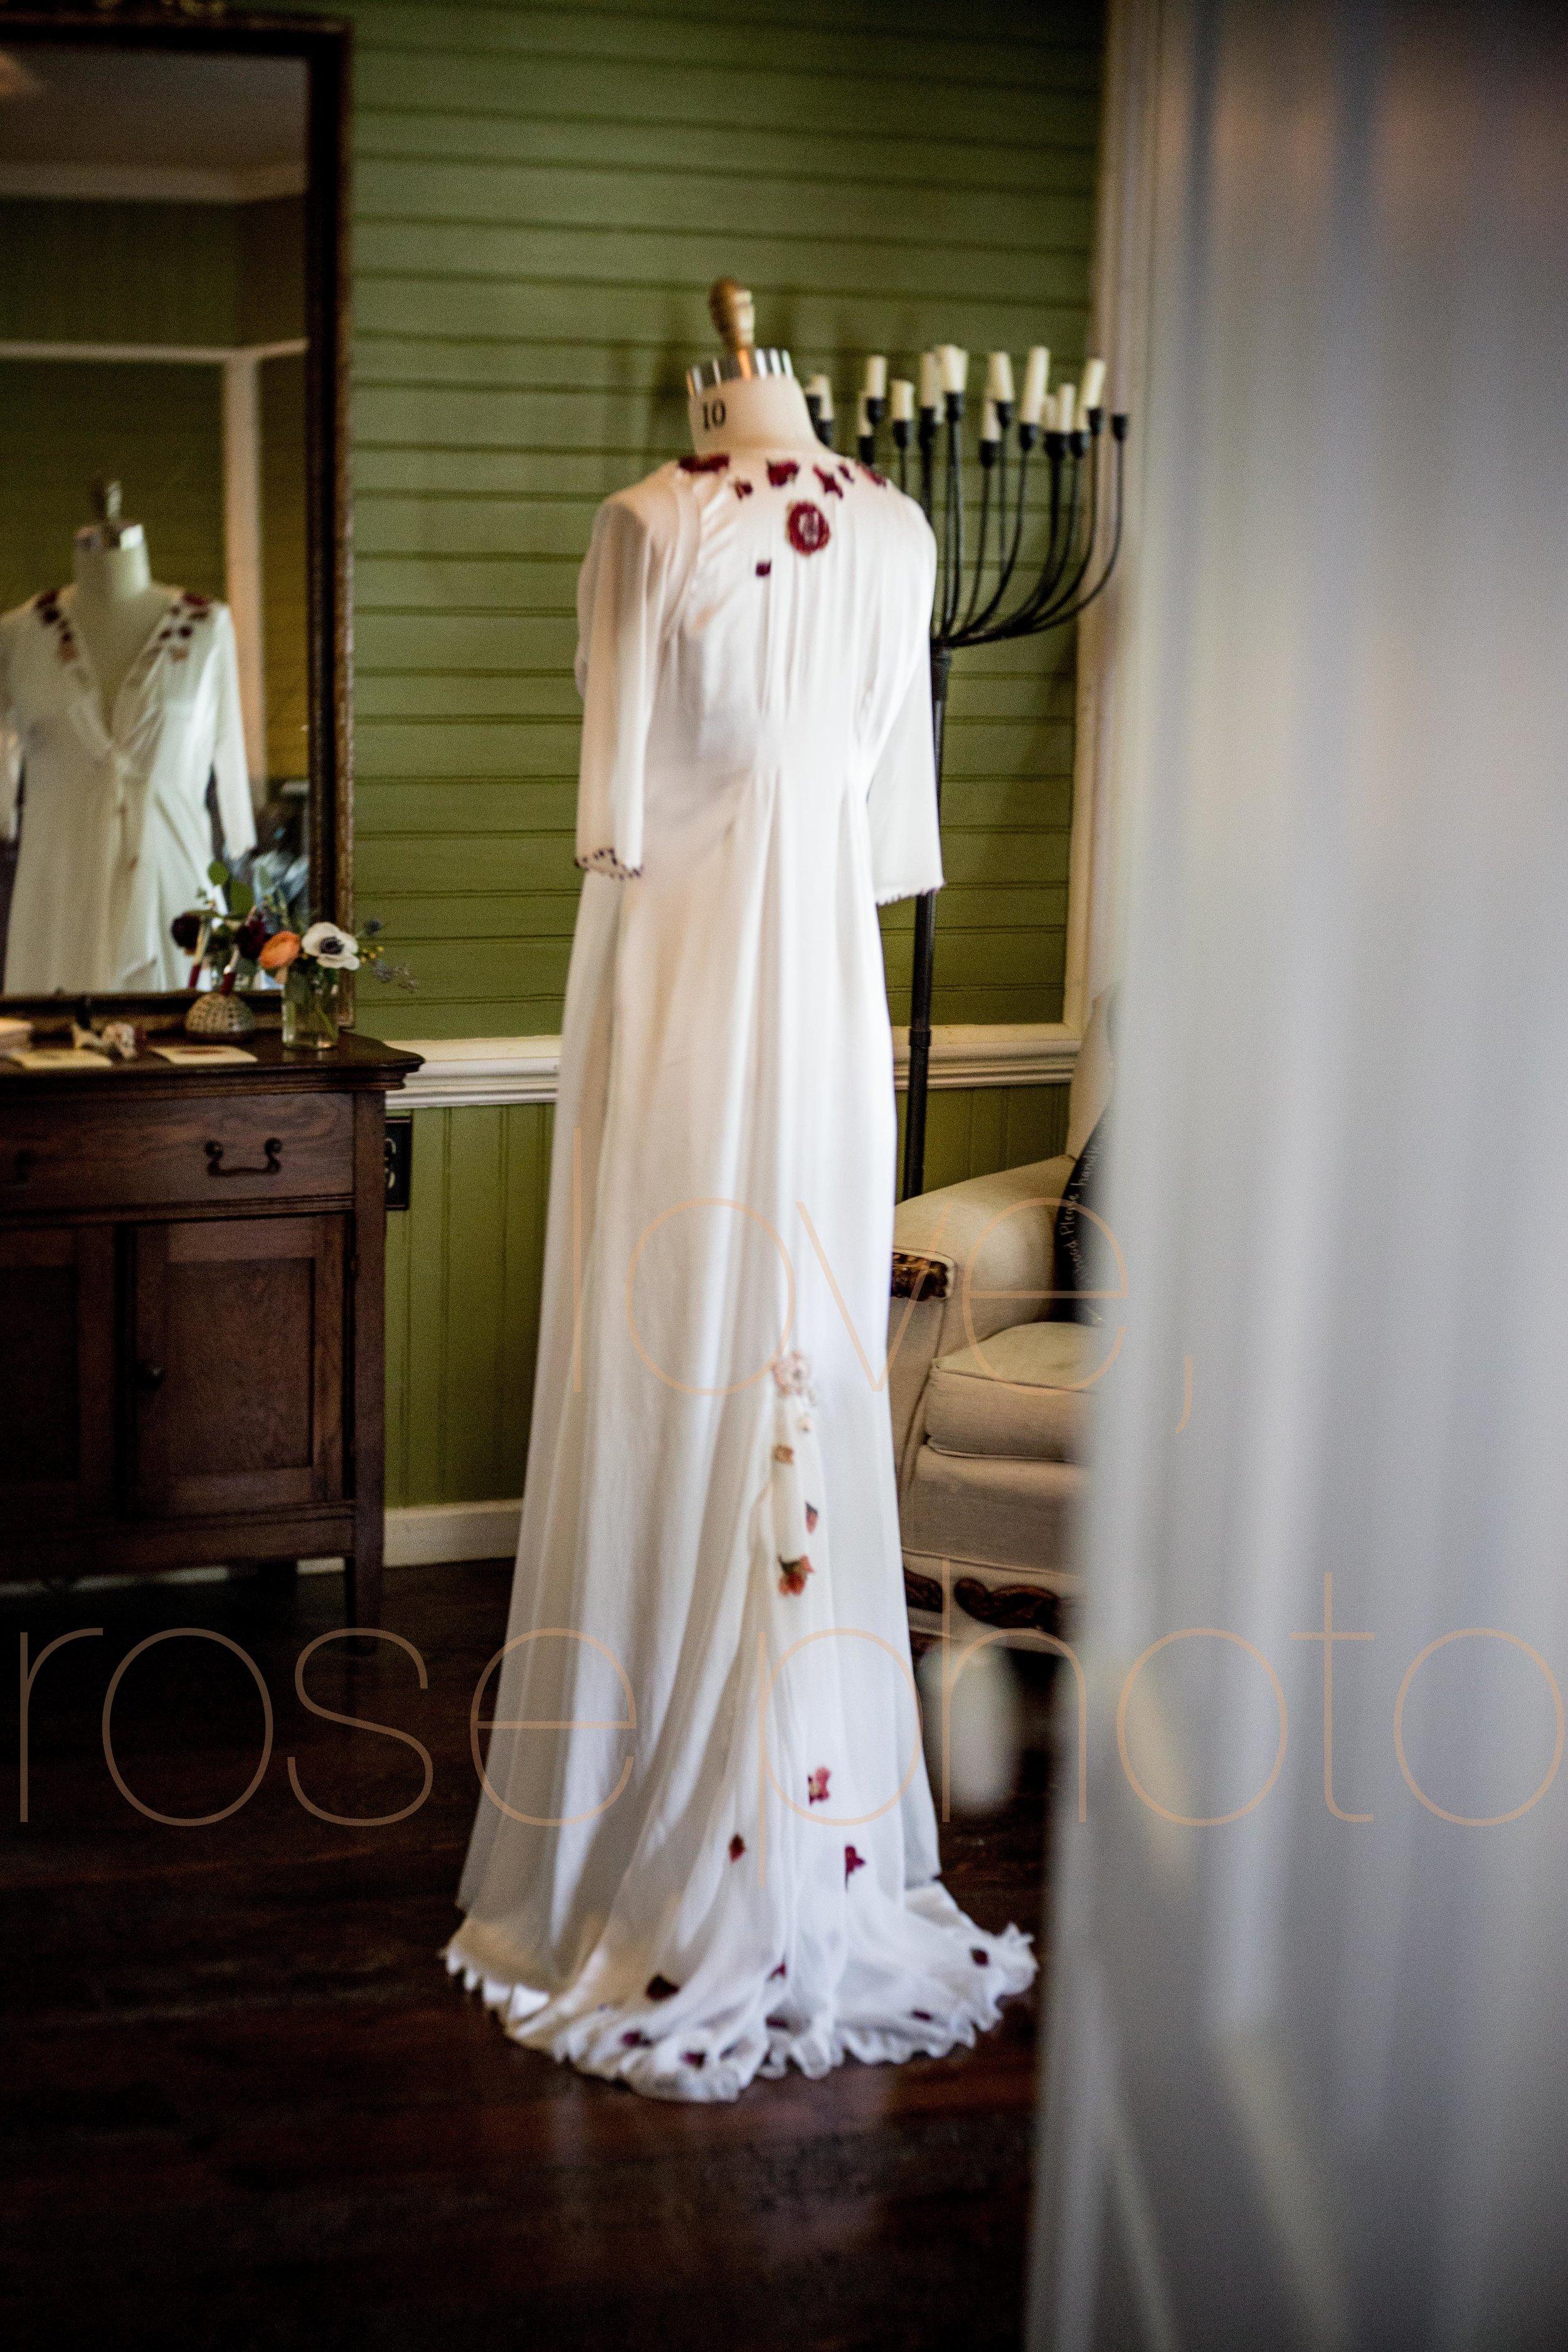 Jane Krame + Jason Ashevegas married asheville best wedding photographers -22.jpg